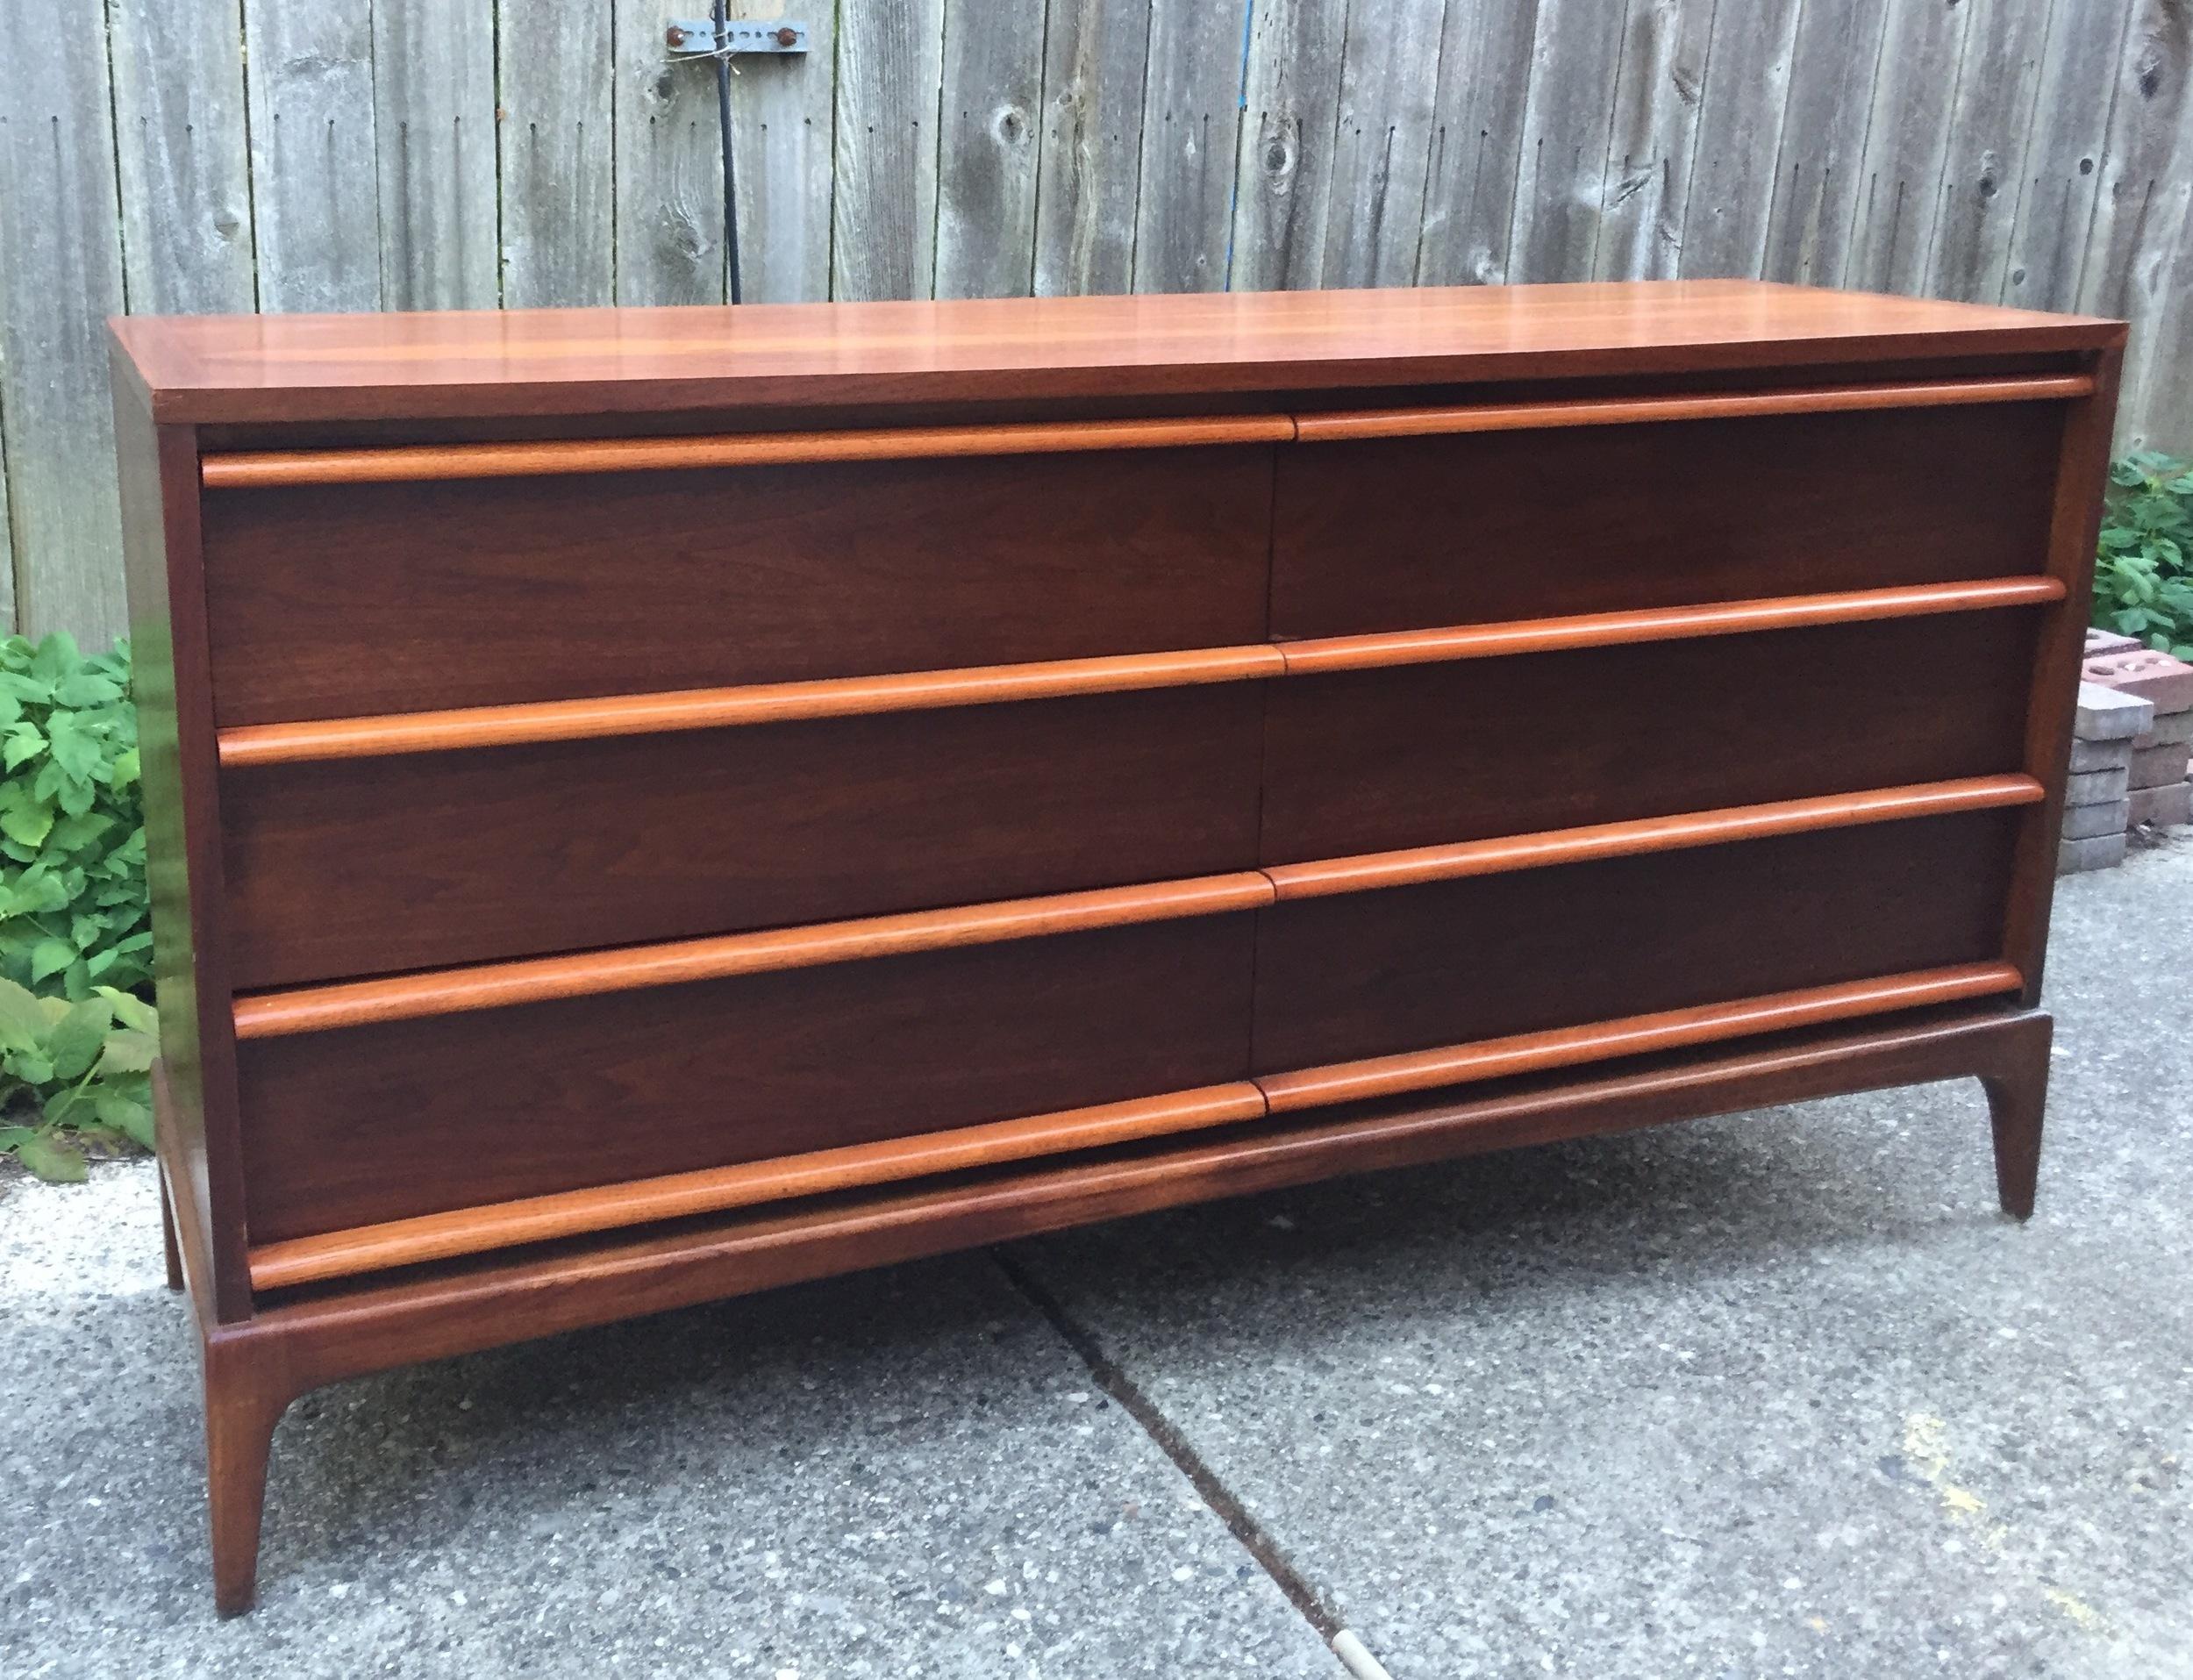 the finished long dresser!